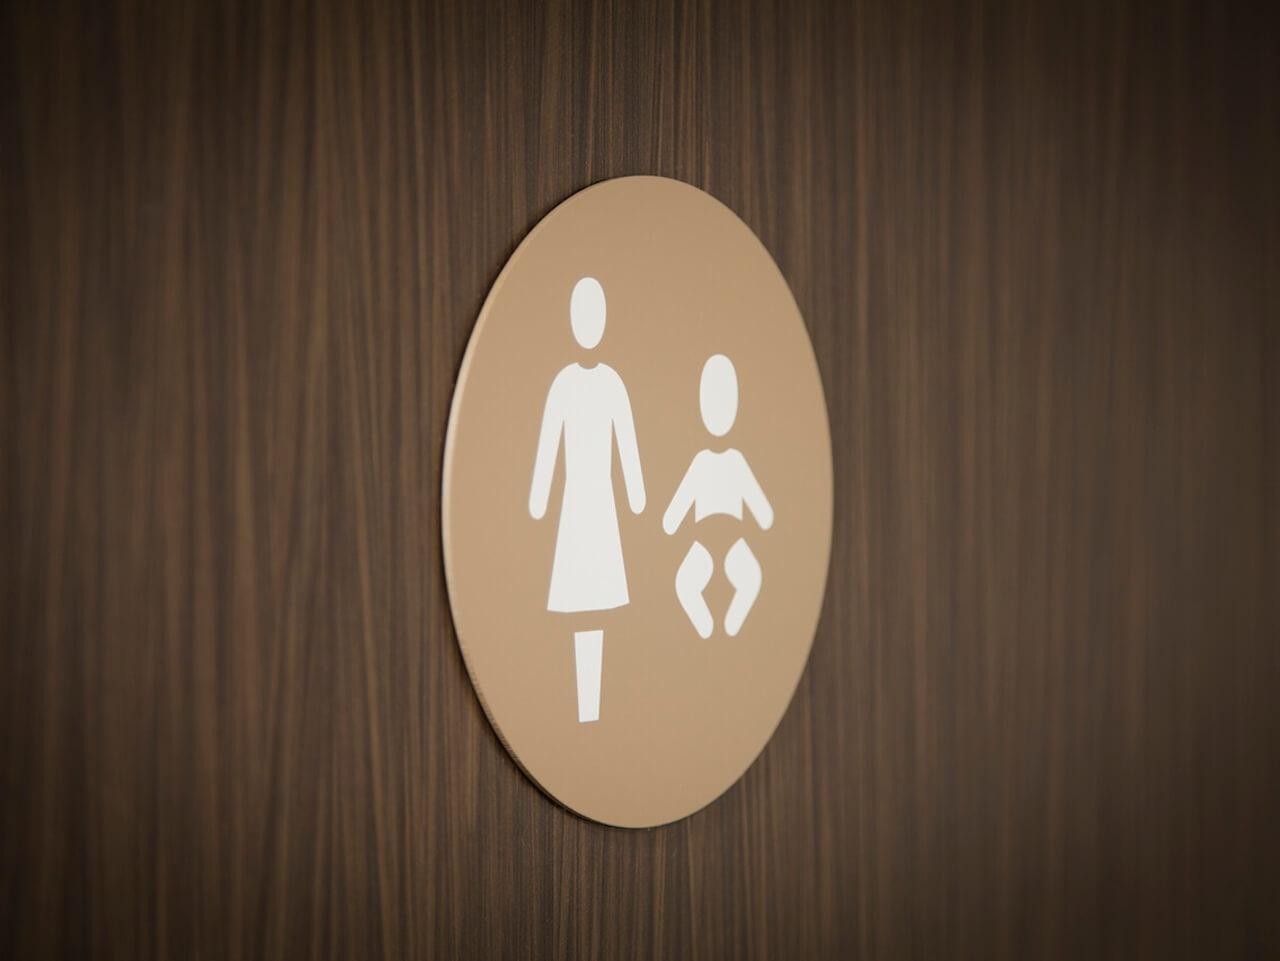 Toilet door signage with pictograms